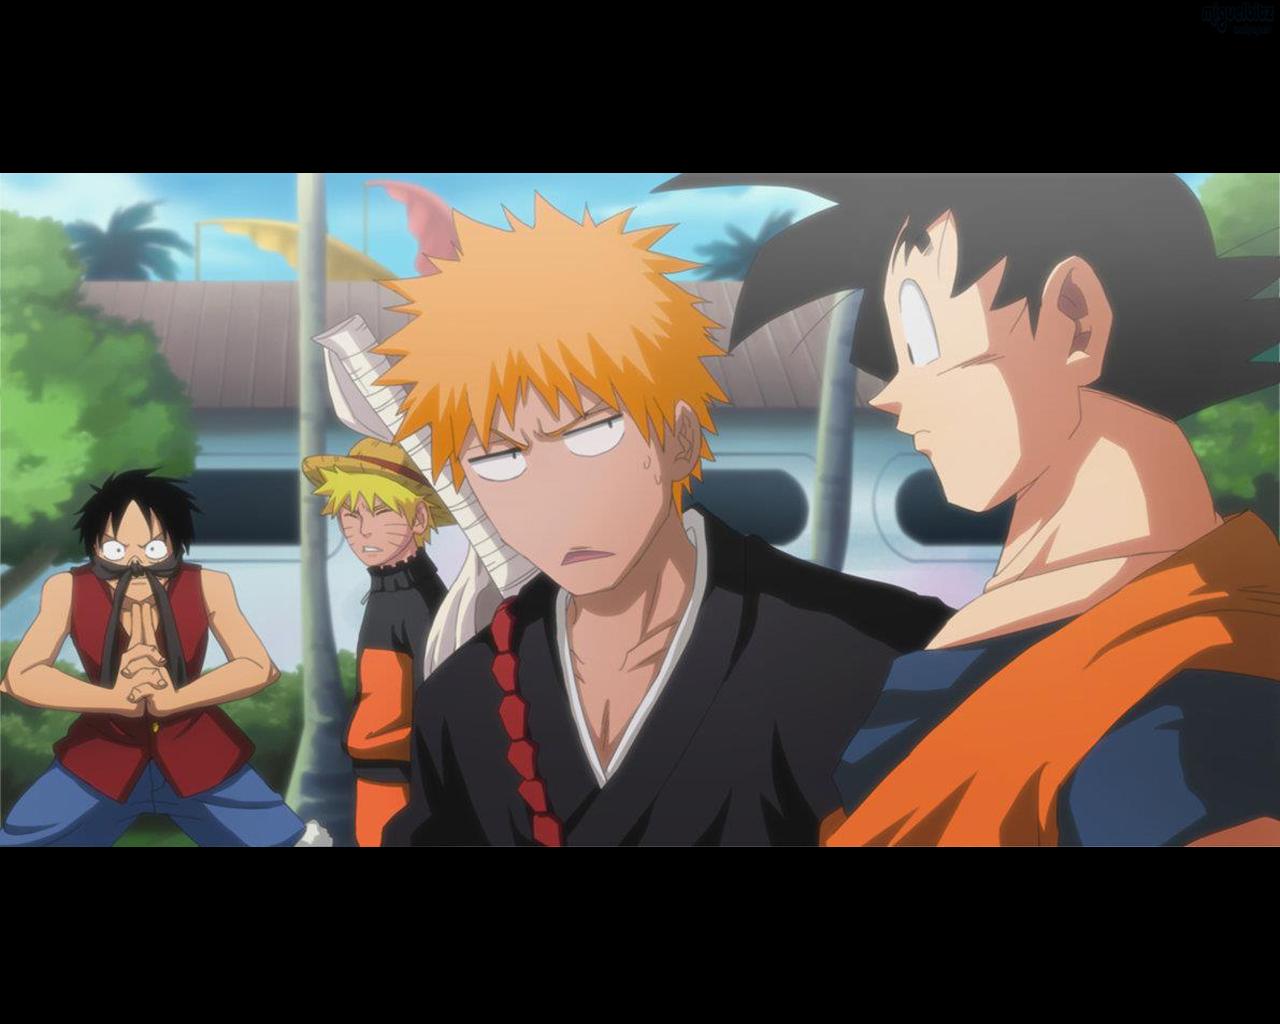 Top Wallpaper Naruto Dbz - op__bleach__naruto_e_dbz_by_nitz1401-d4orq2g  Gallery_458630.jpg